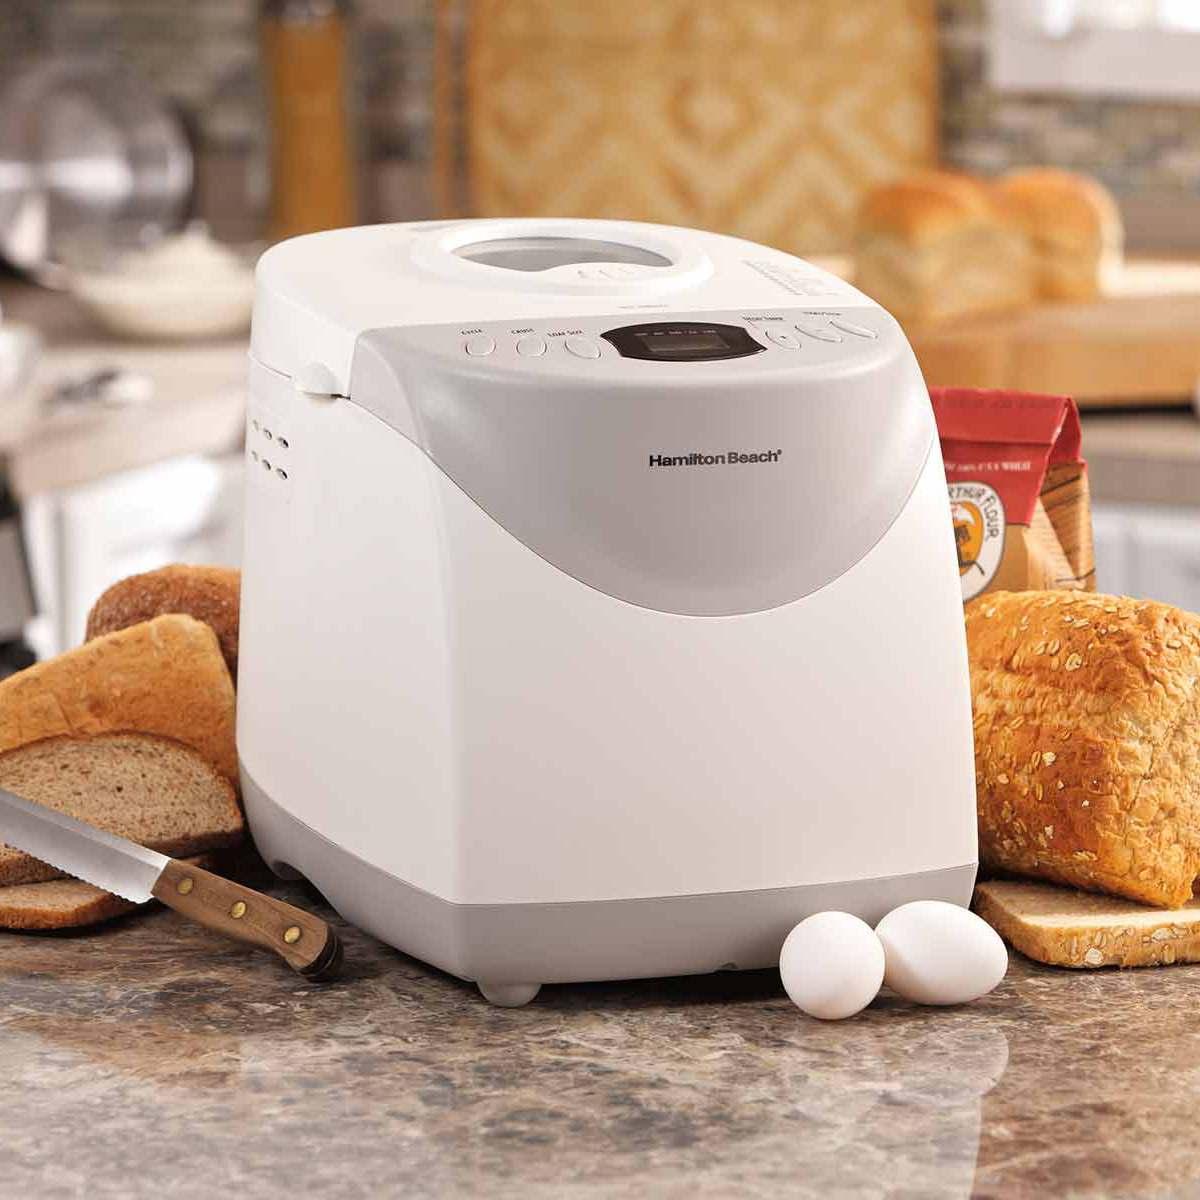 Hamilton Beach Homebaker 2 Pound Bread Maker 29881 Wiring Diagram Of Washing Machine Timer Thumbnail